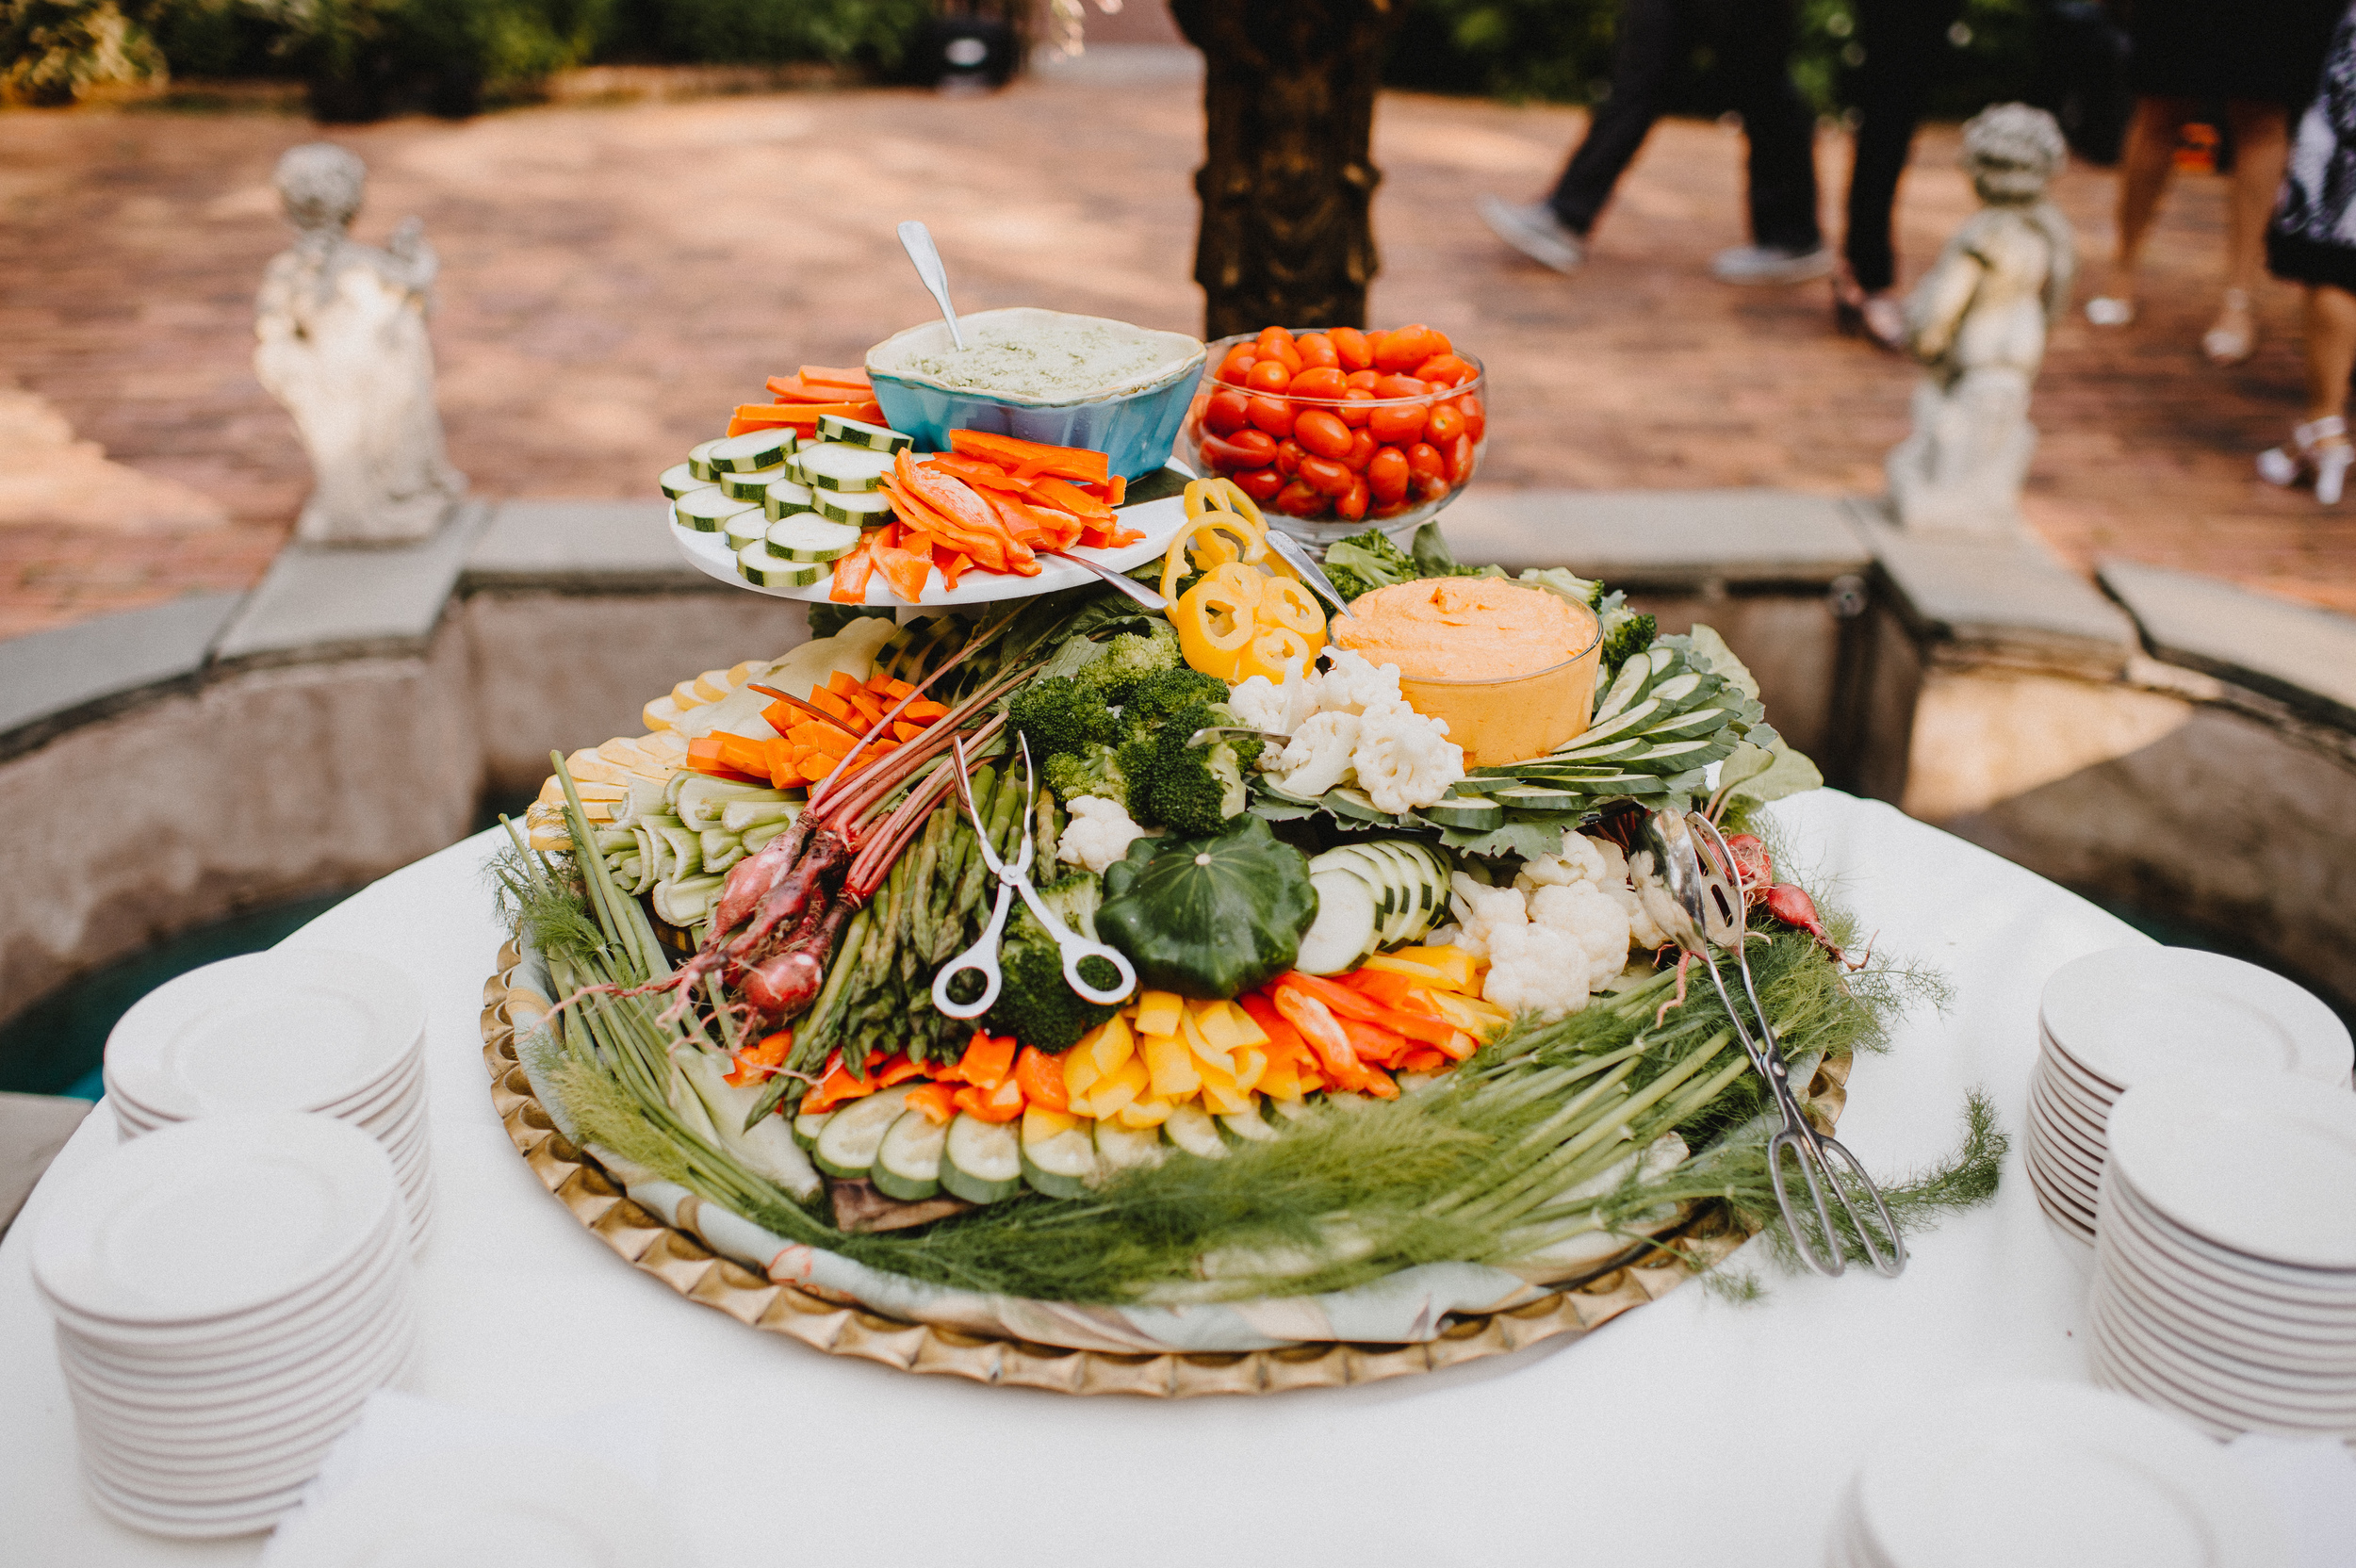 holly-hedge-estate-wedding-photographer-pat-robinson-photography-69.jpg